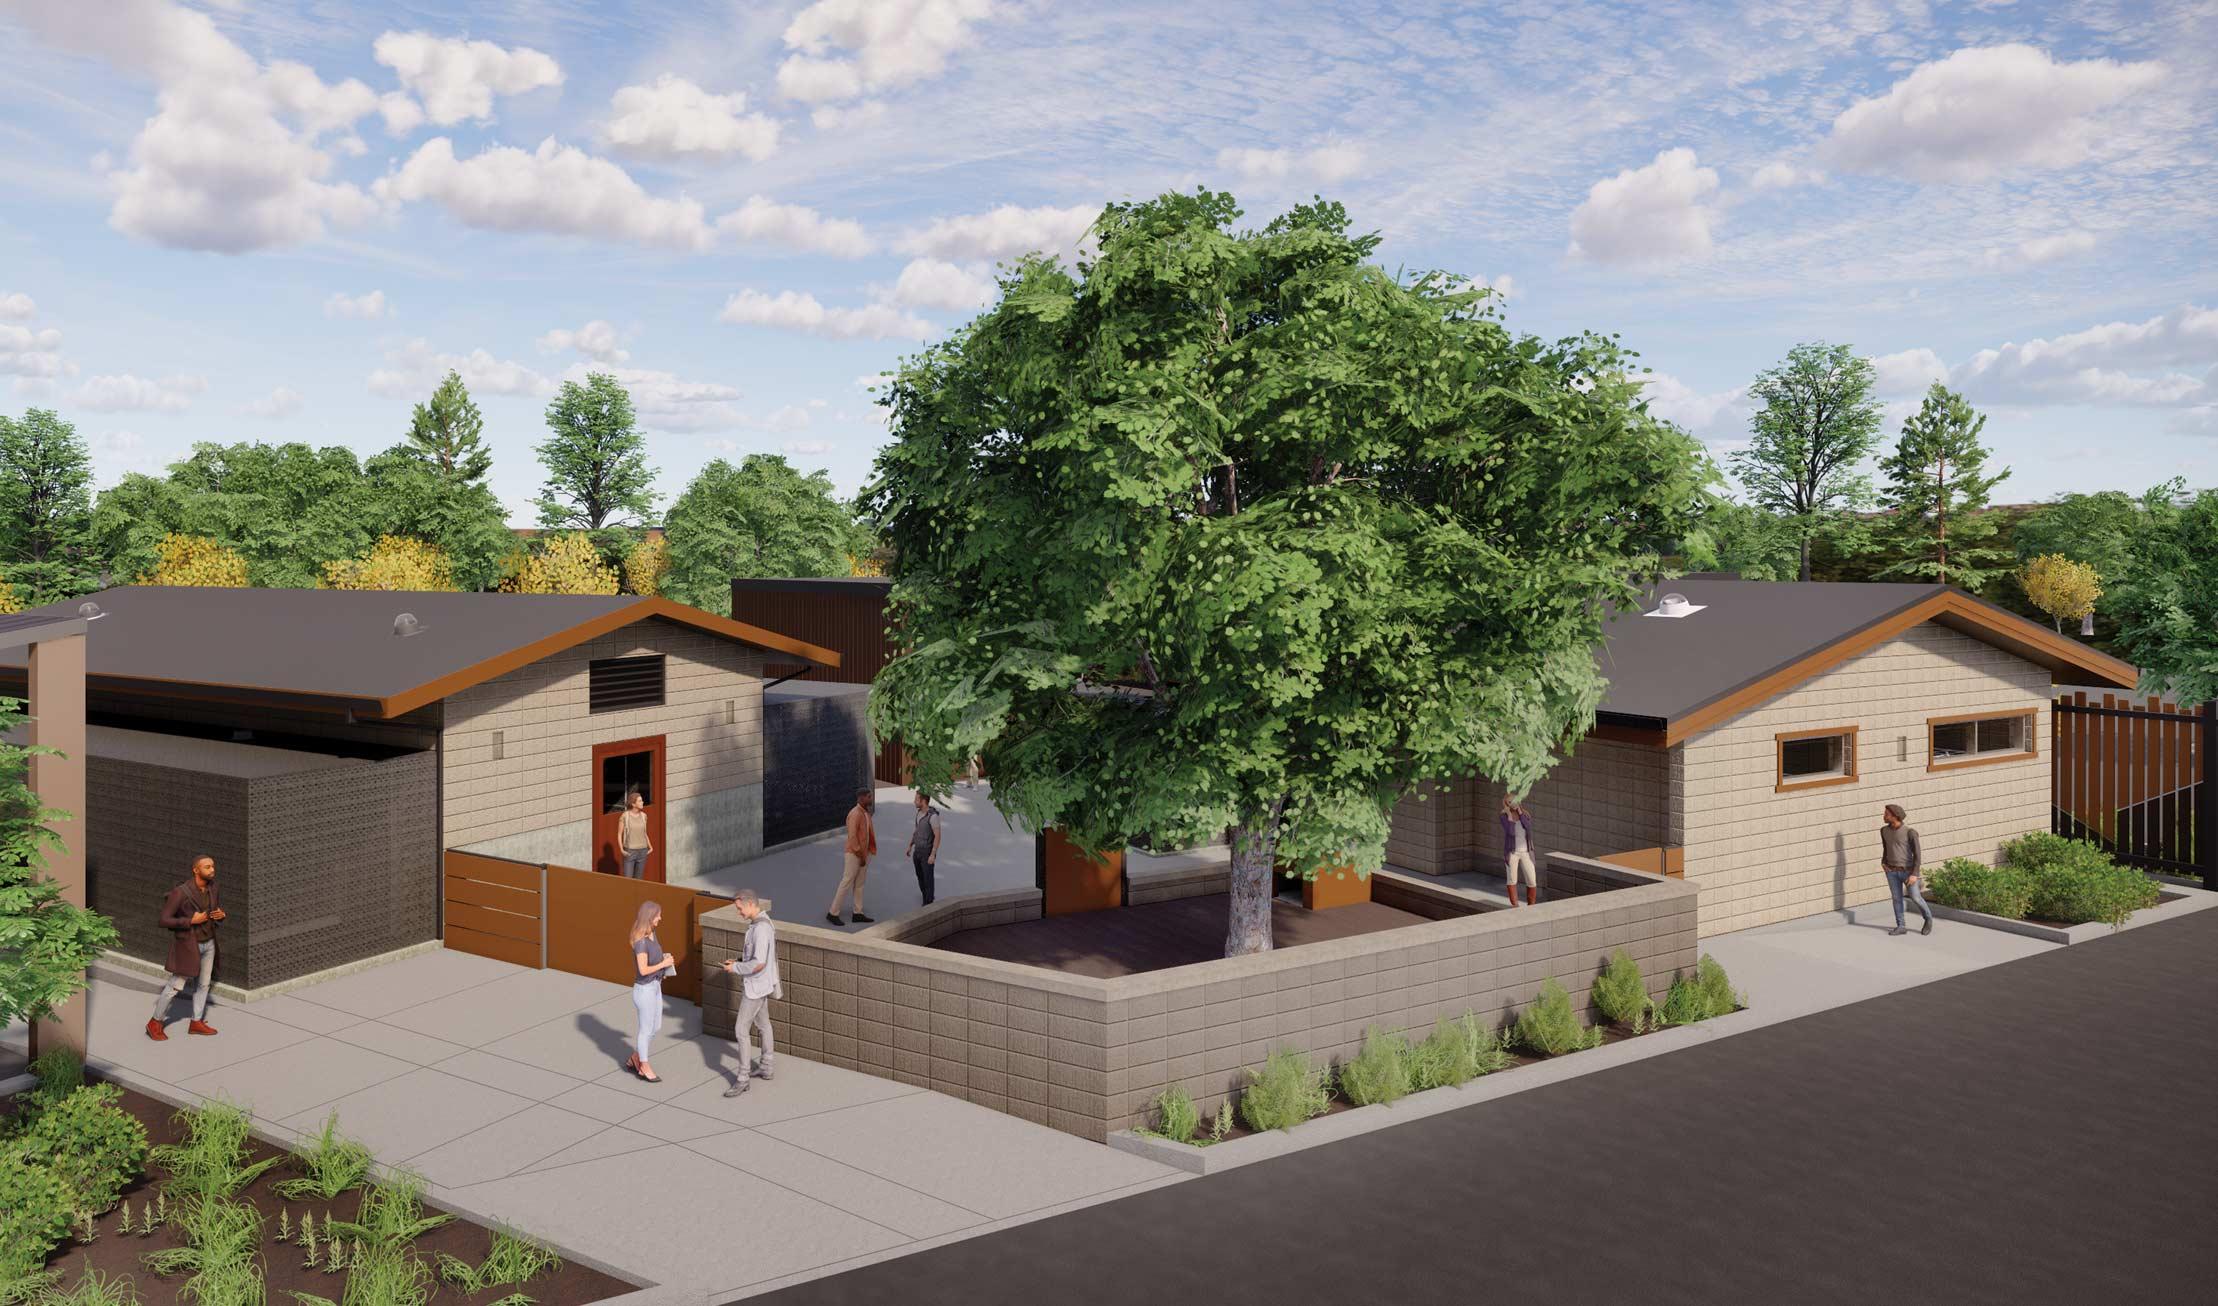 Fresno Chaffee Zoo Ambassador Building Render